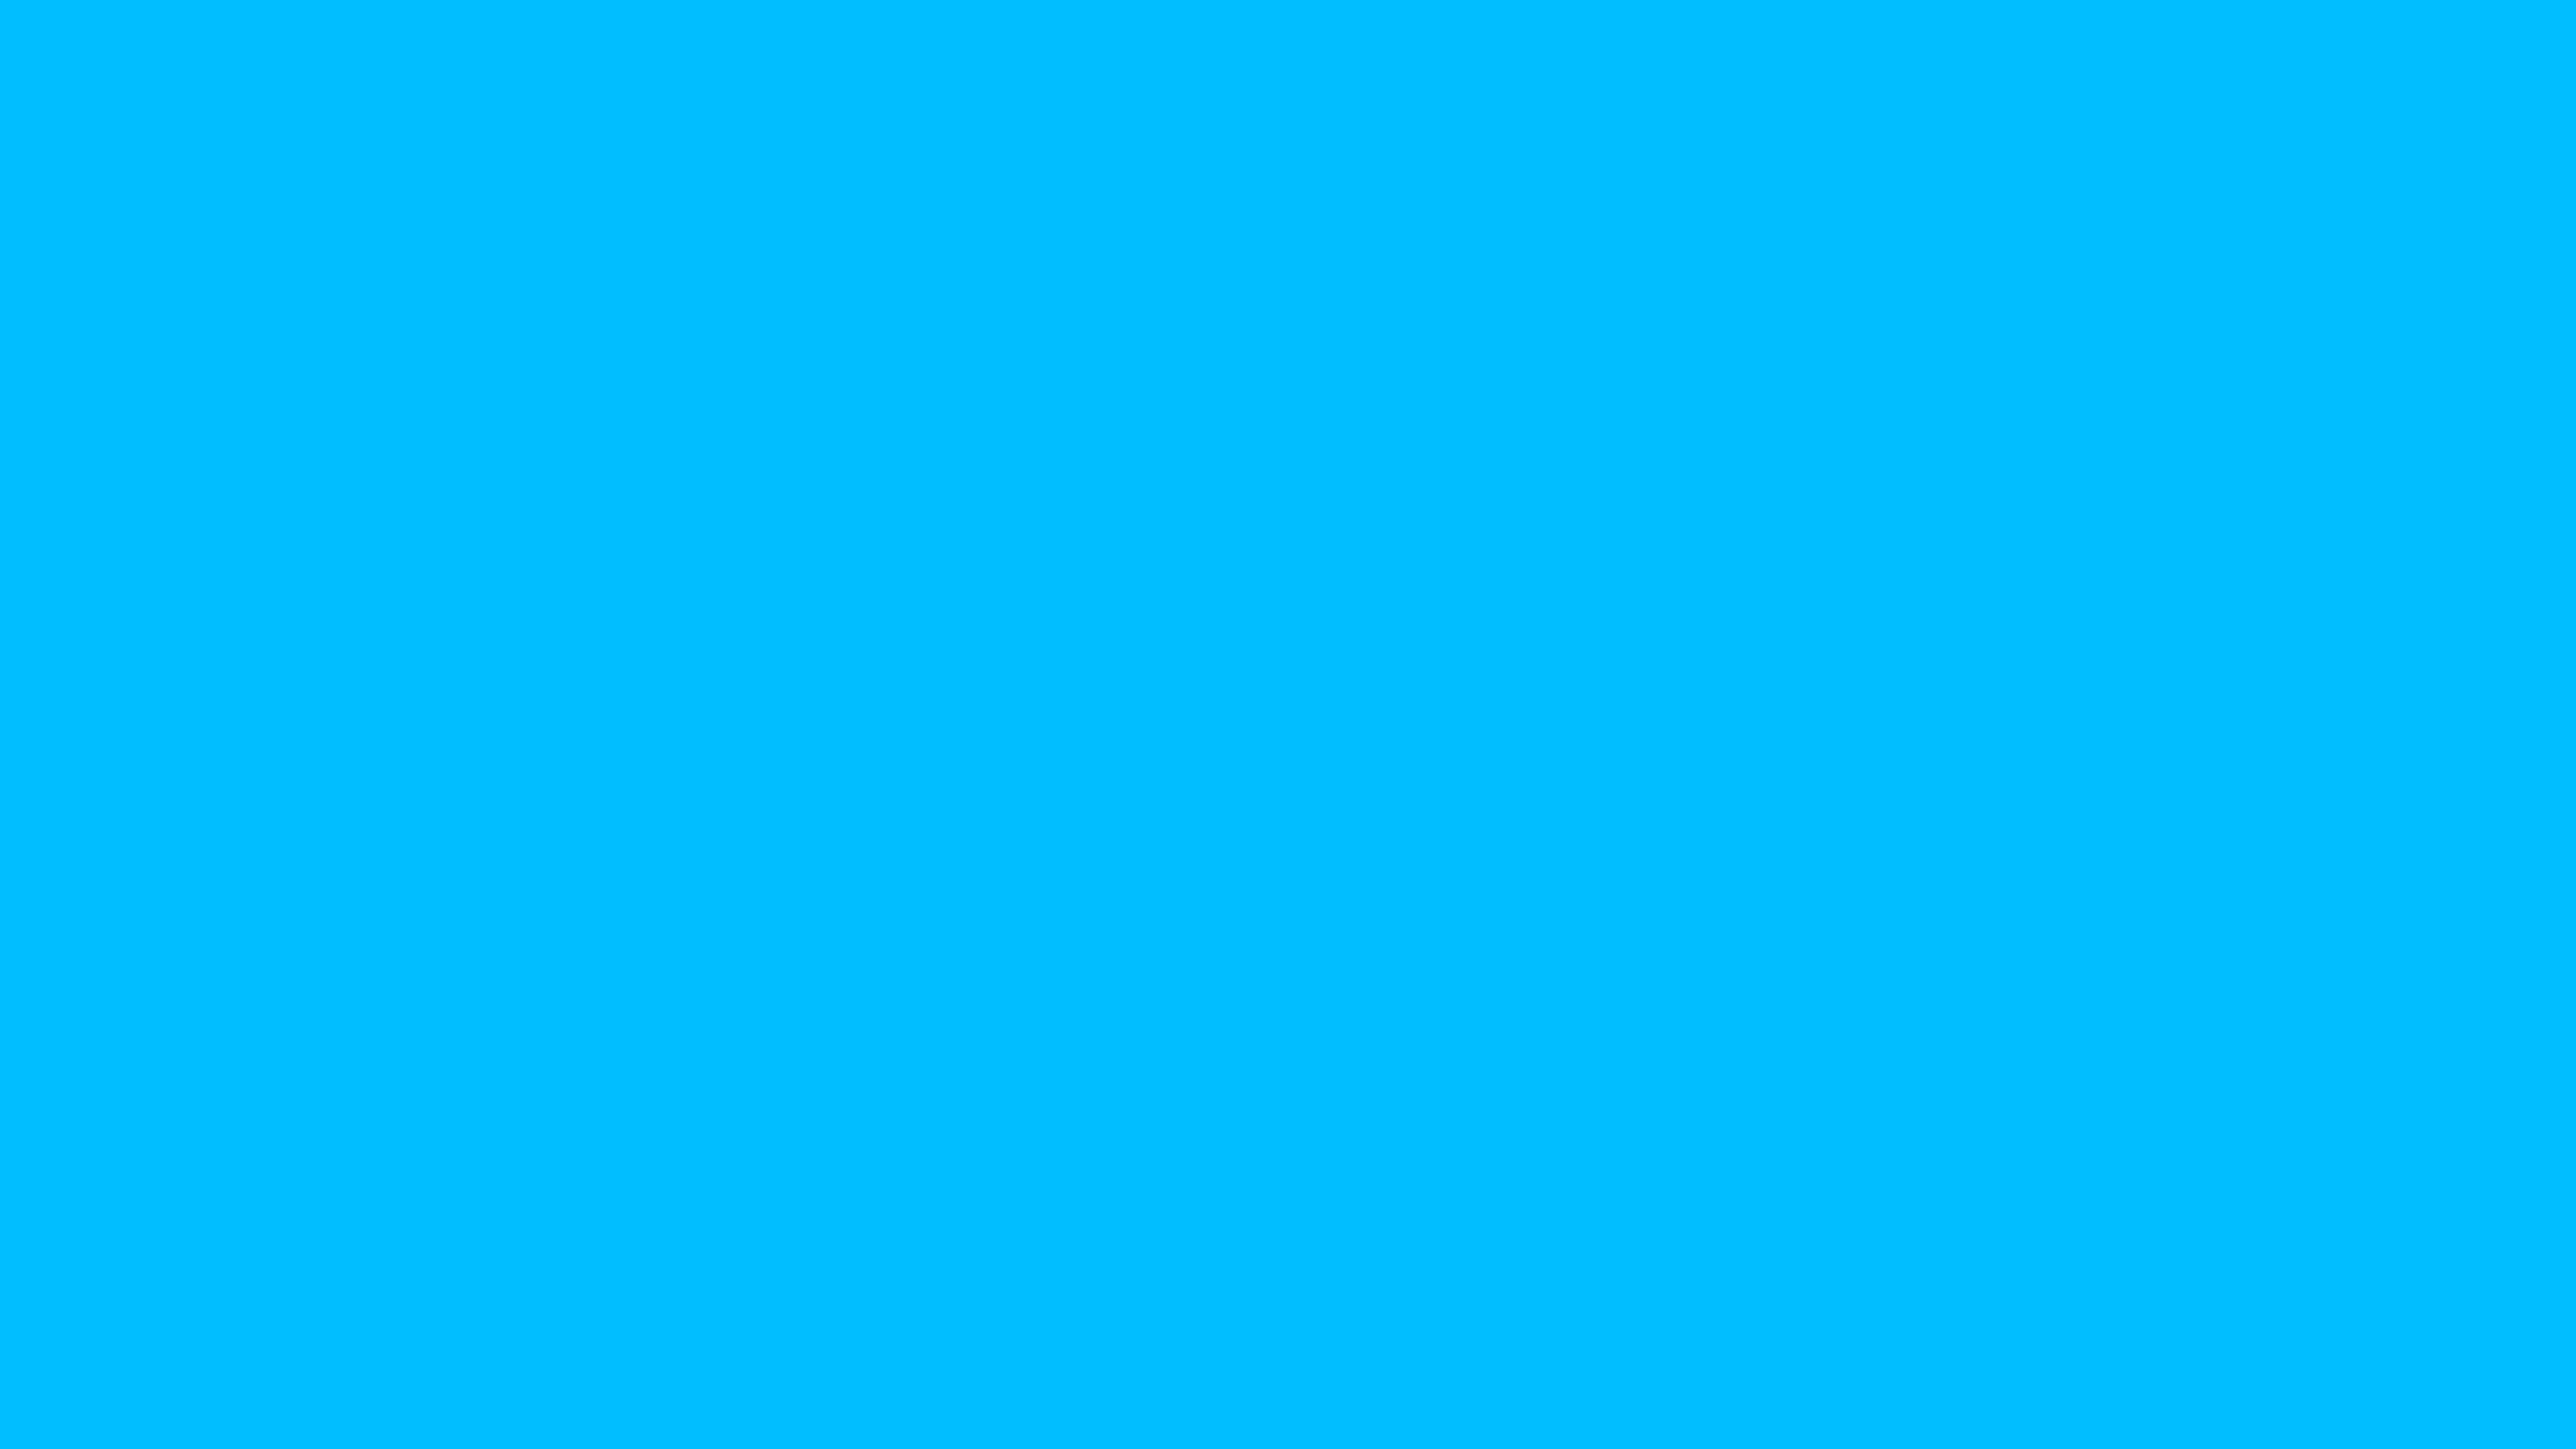 4096x2304 Capri Solid Color Background